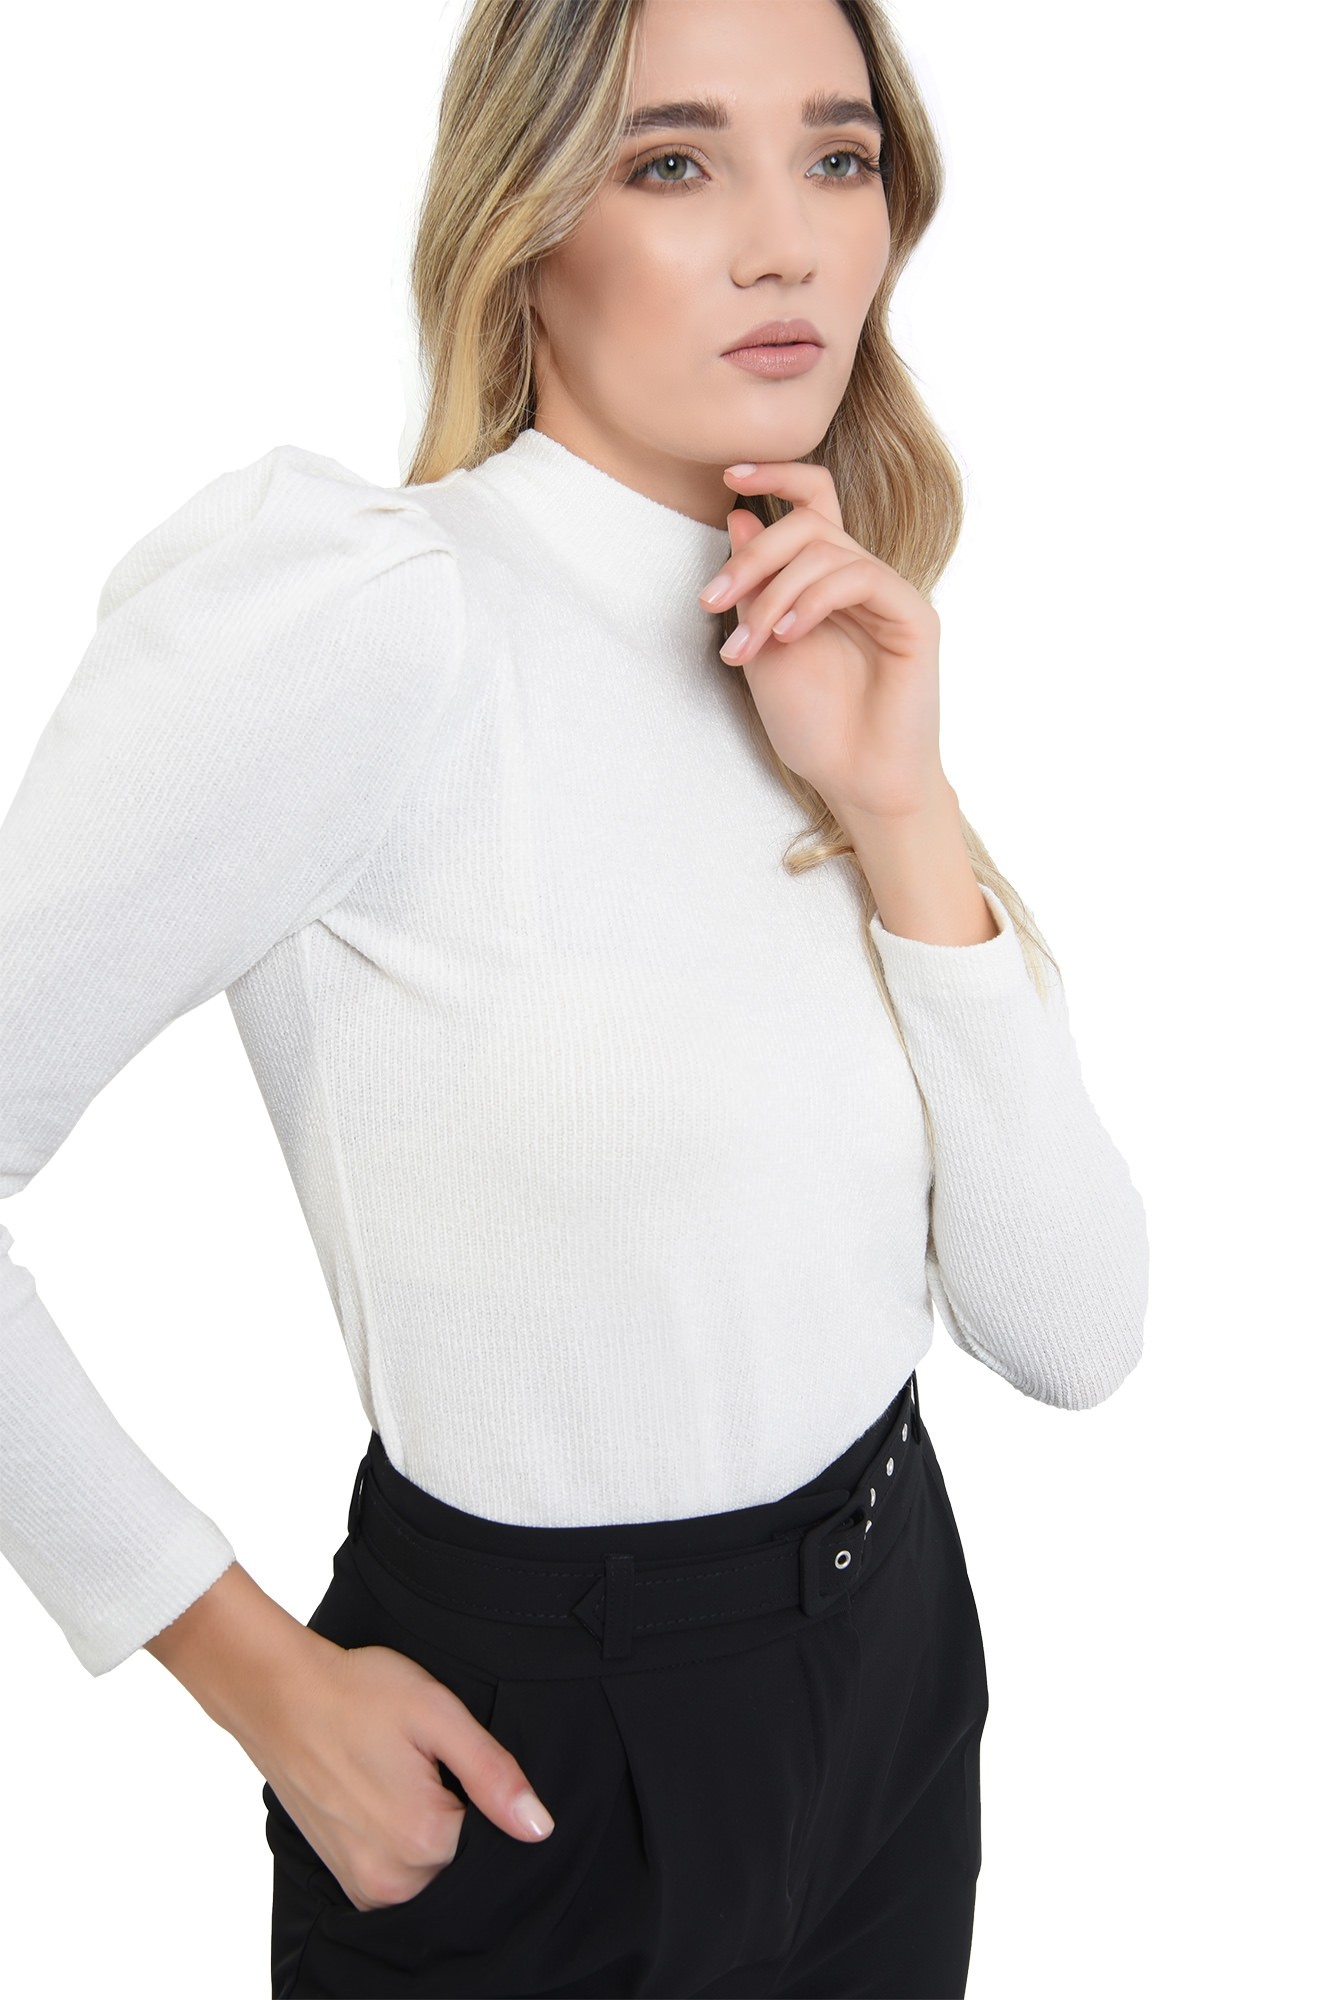 3 - pulover cu umeri accentuati, tricotat, alb, cu maneca lunga